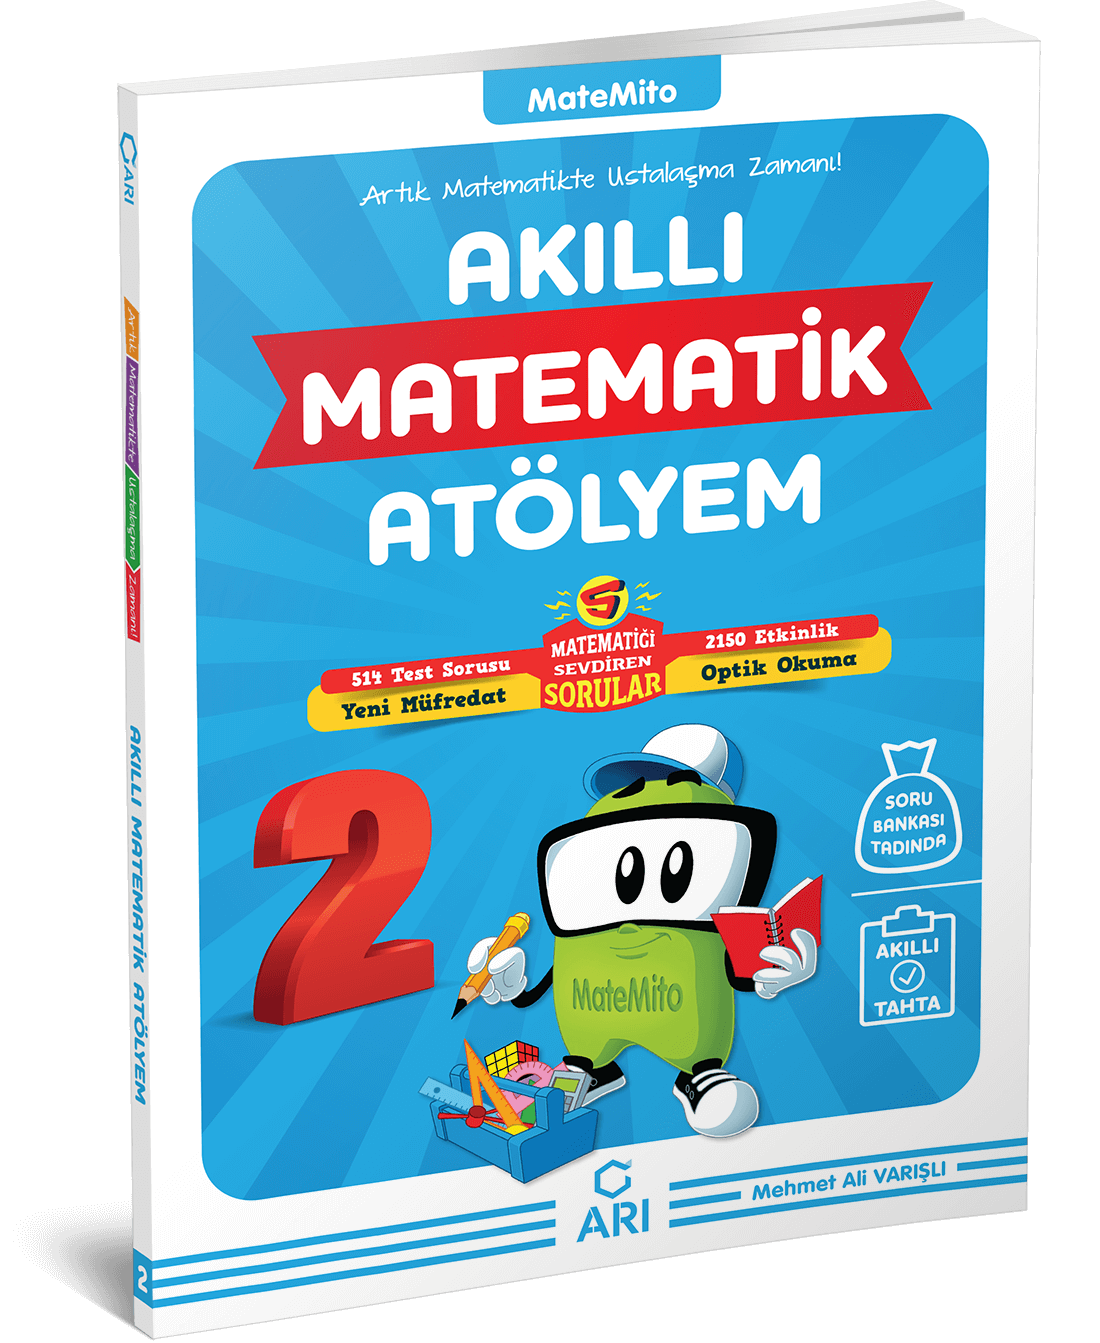 Matemito Akıllı Matematik Atölyem 2.Sınıf